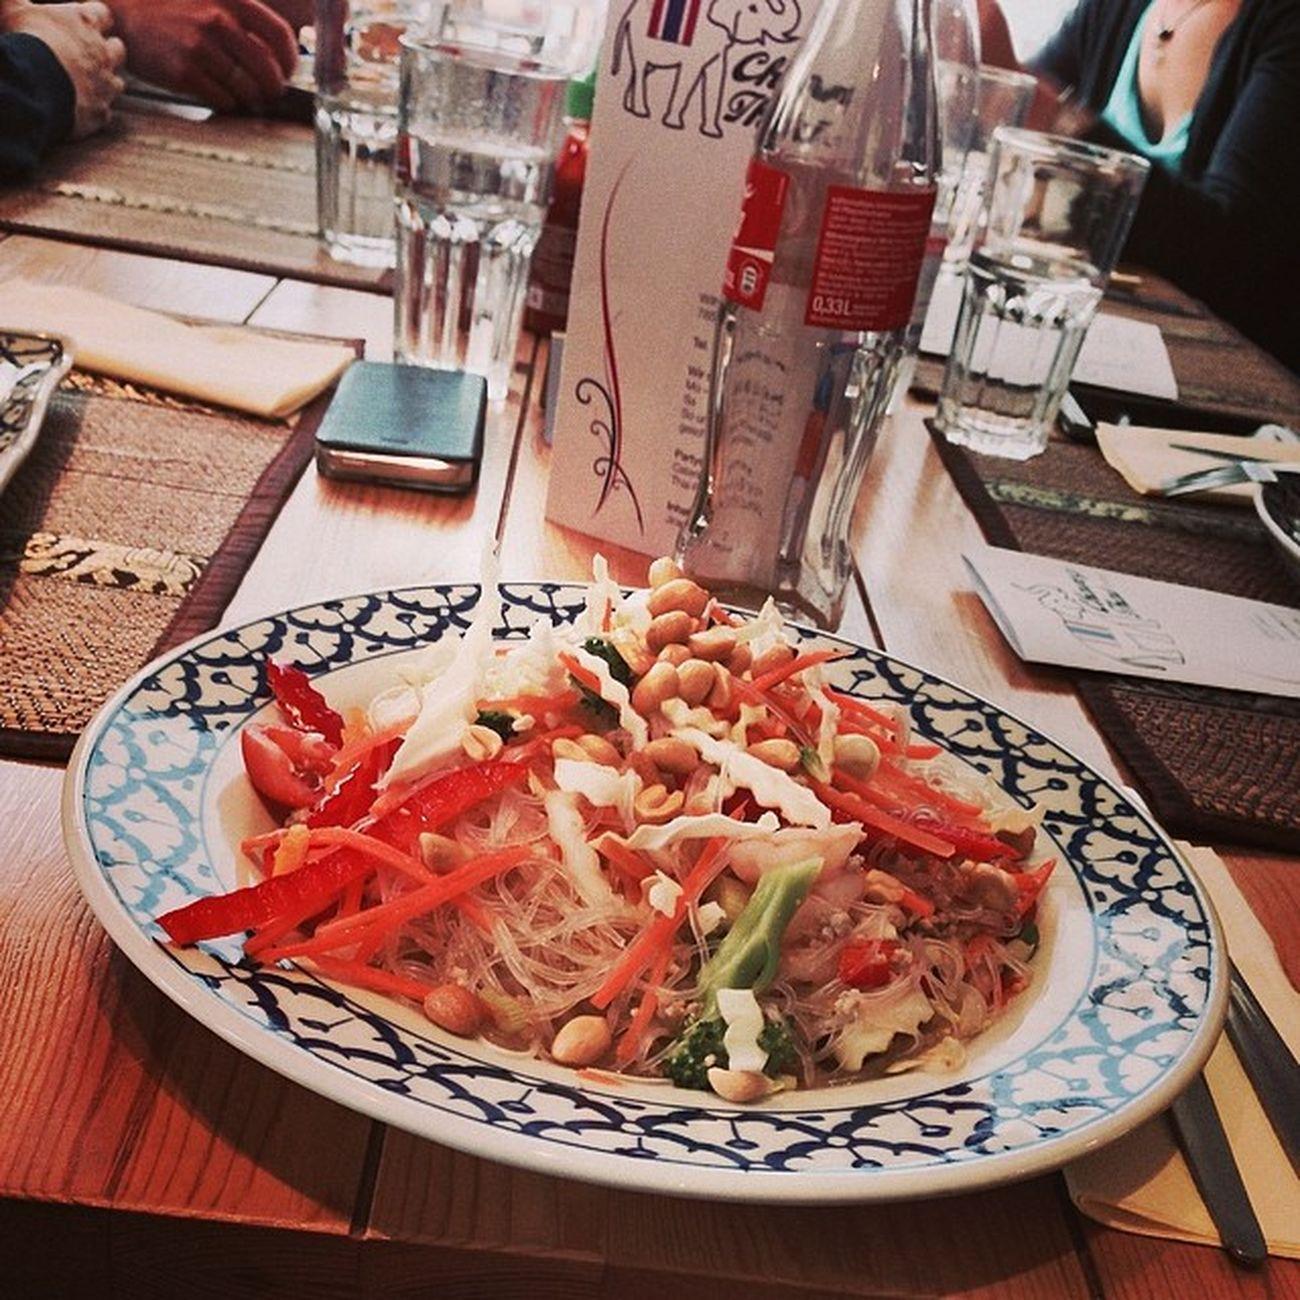 Yam Wun Sen... #mahlzeit Yamwunsen Food Essen Foodporn Mahlzeit Thaifood Instafood Tuttlingen Tweetuptut Foodkoma Changthai